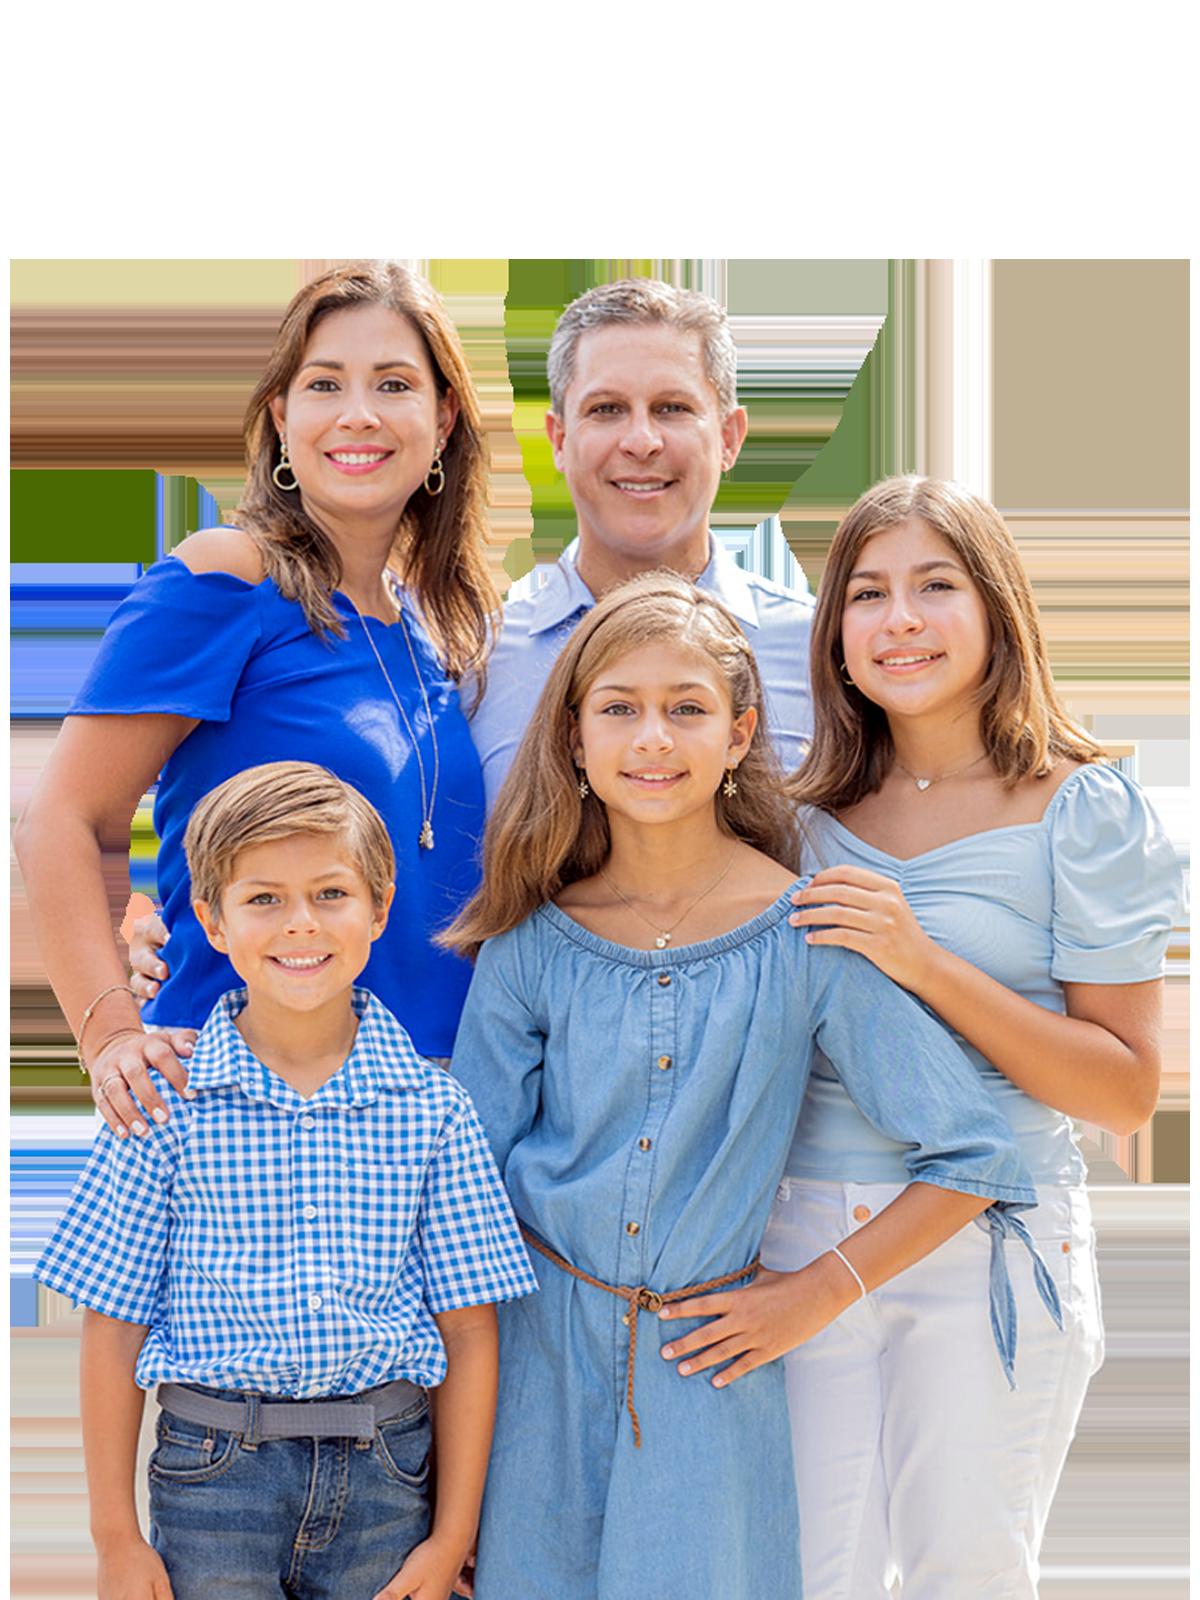 http://familyfirst-dental.com/wp-content/uploads/2021/09/sign_familypic.png